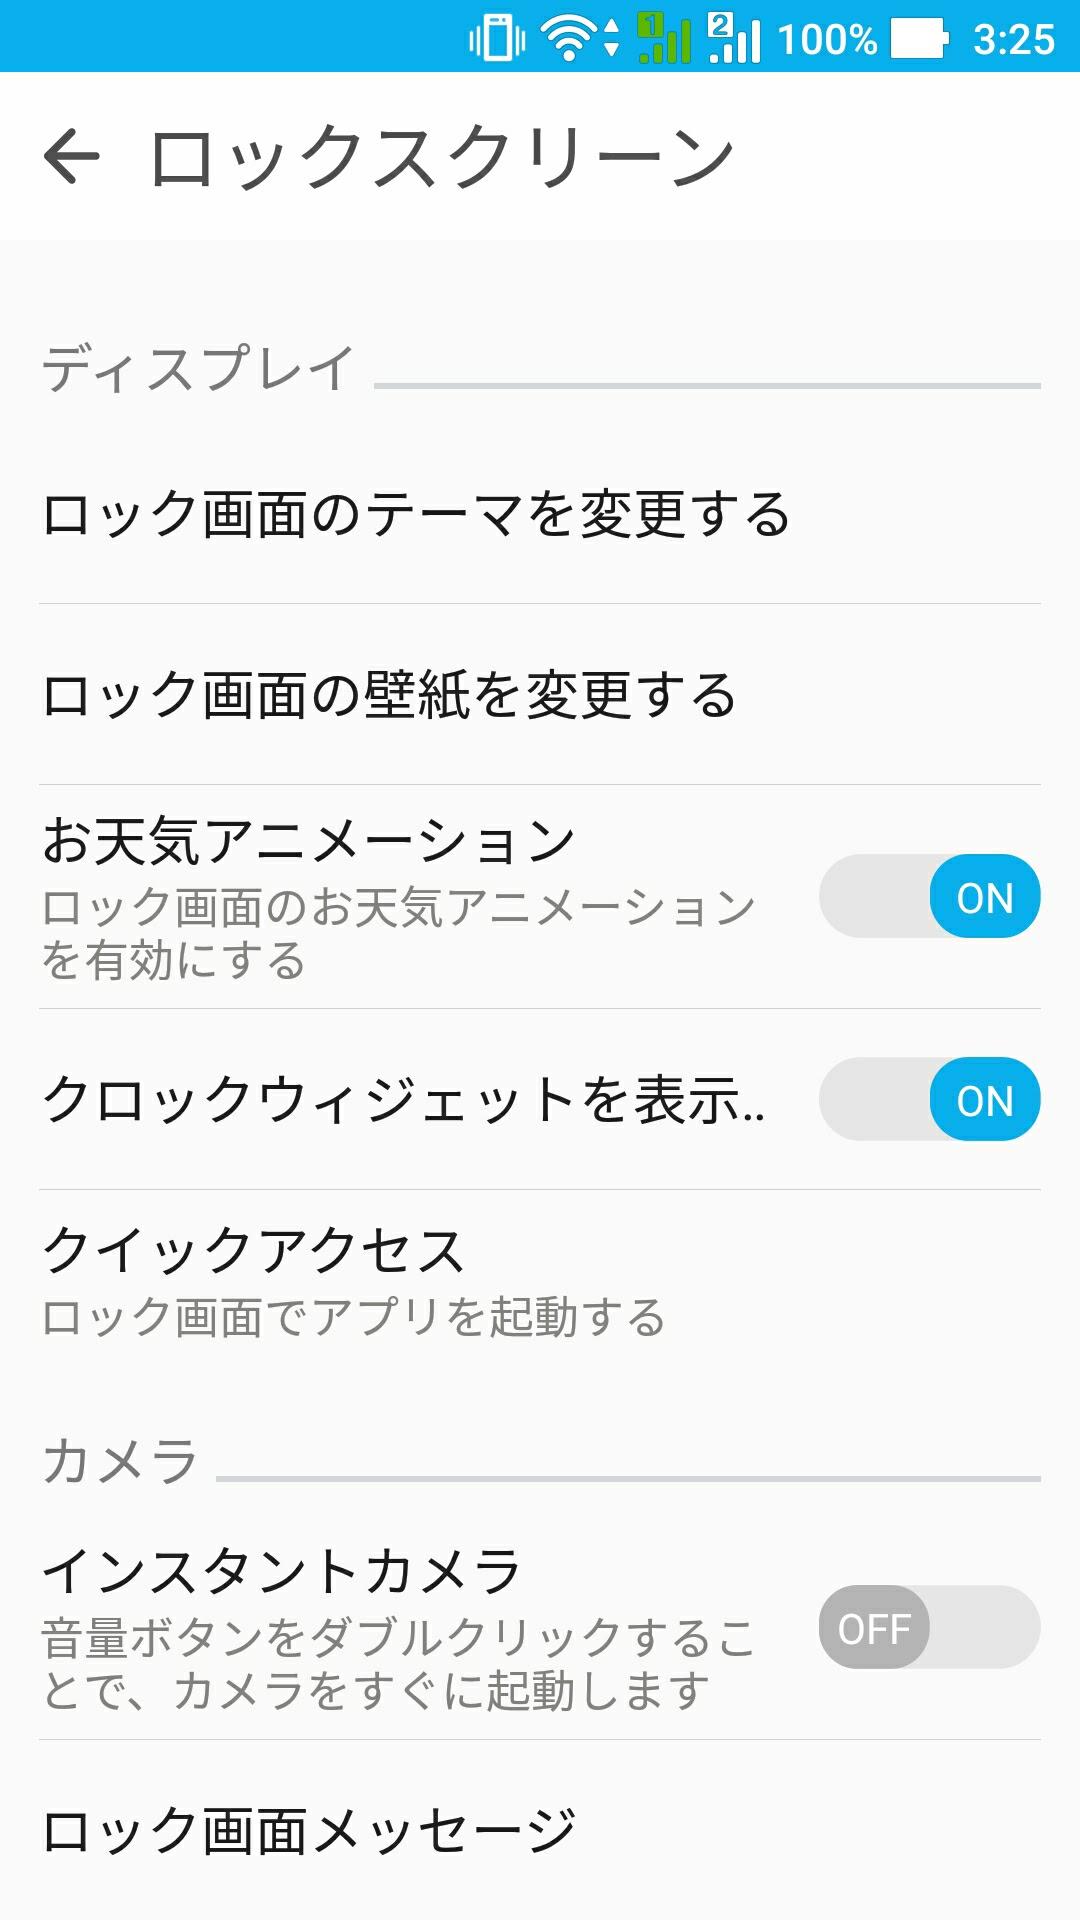 Zenfone 3で確認しておきたい独自機能 設定8項目 ガジェットショット